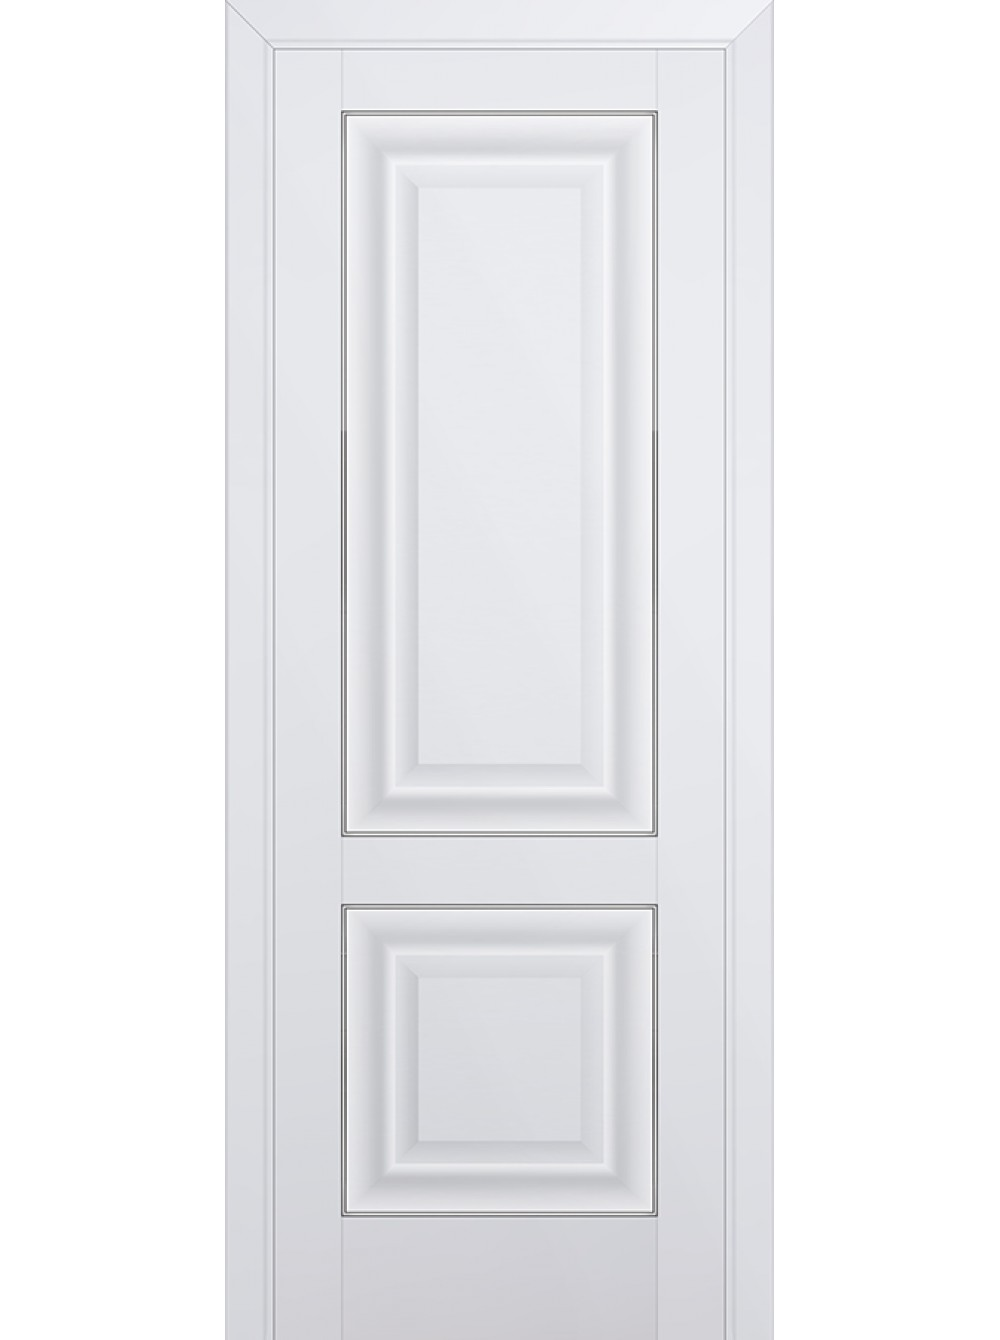 Комплект раздвижной двери Profildoors 27U (Аляска) 2000х600-800х36 мм (коробка, наличники, добор) фото